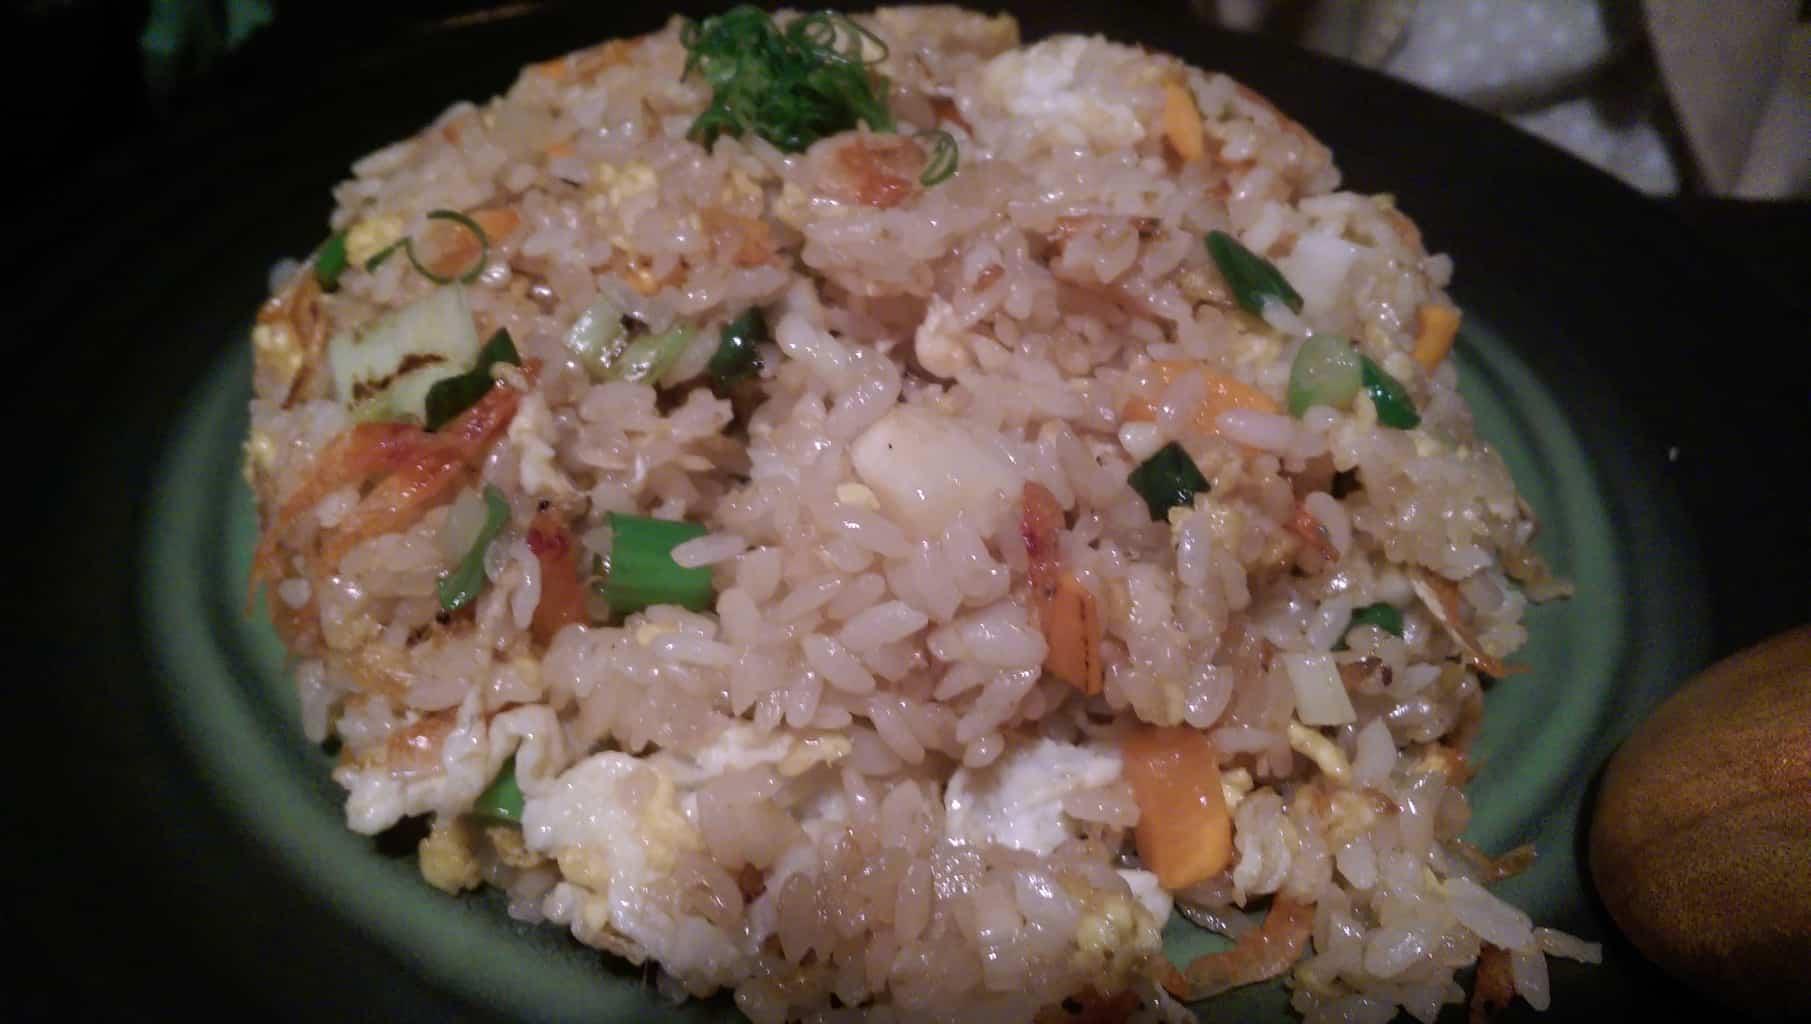 Sergestid shrimp fried rice (NT$180)